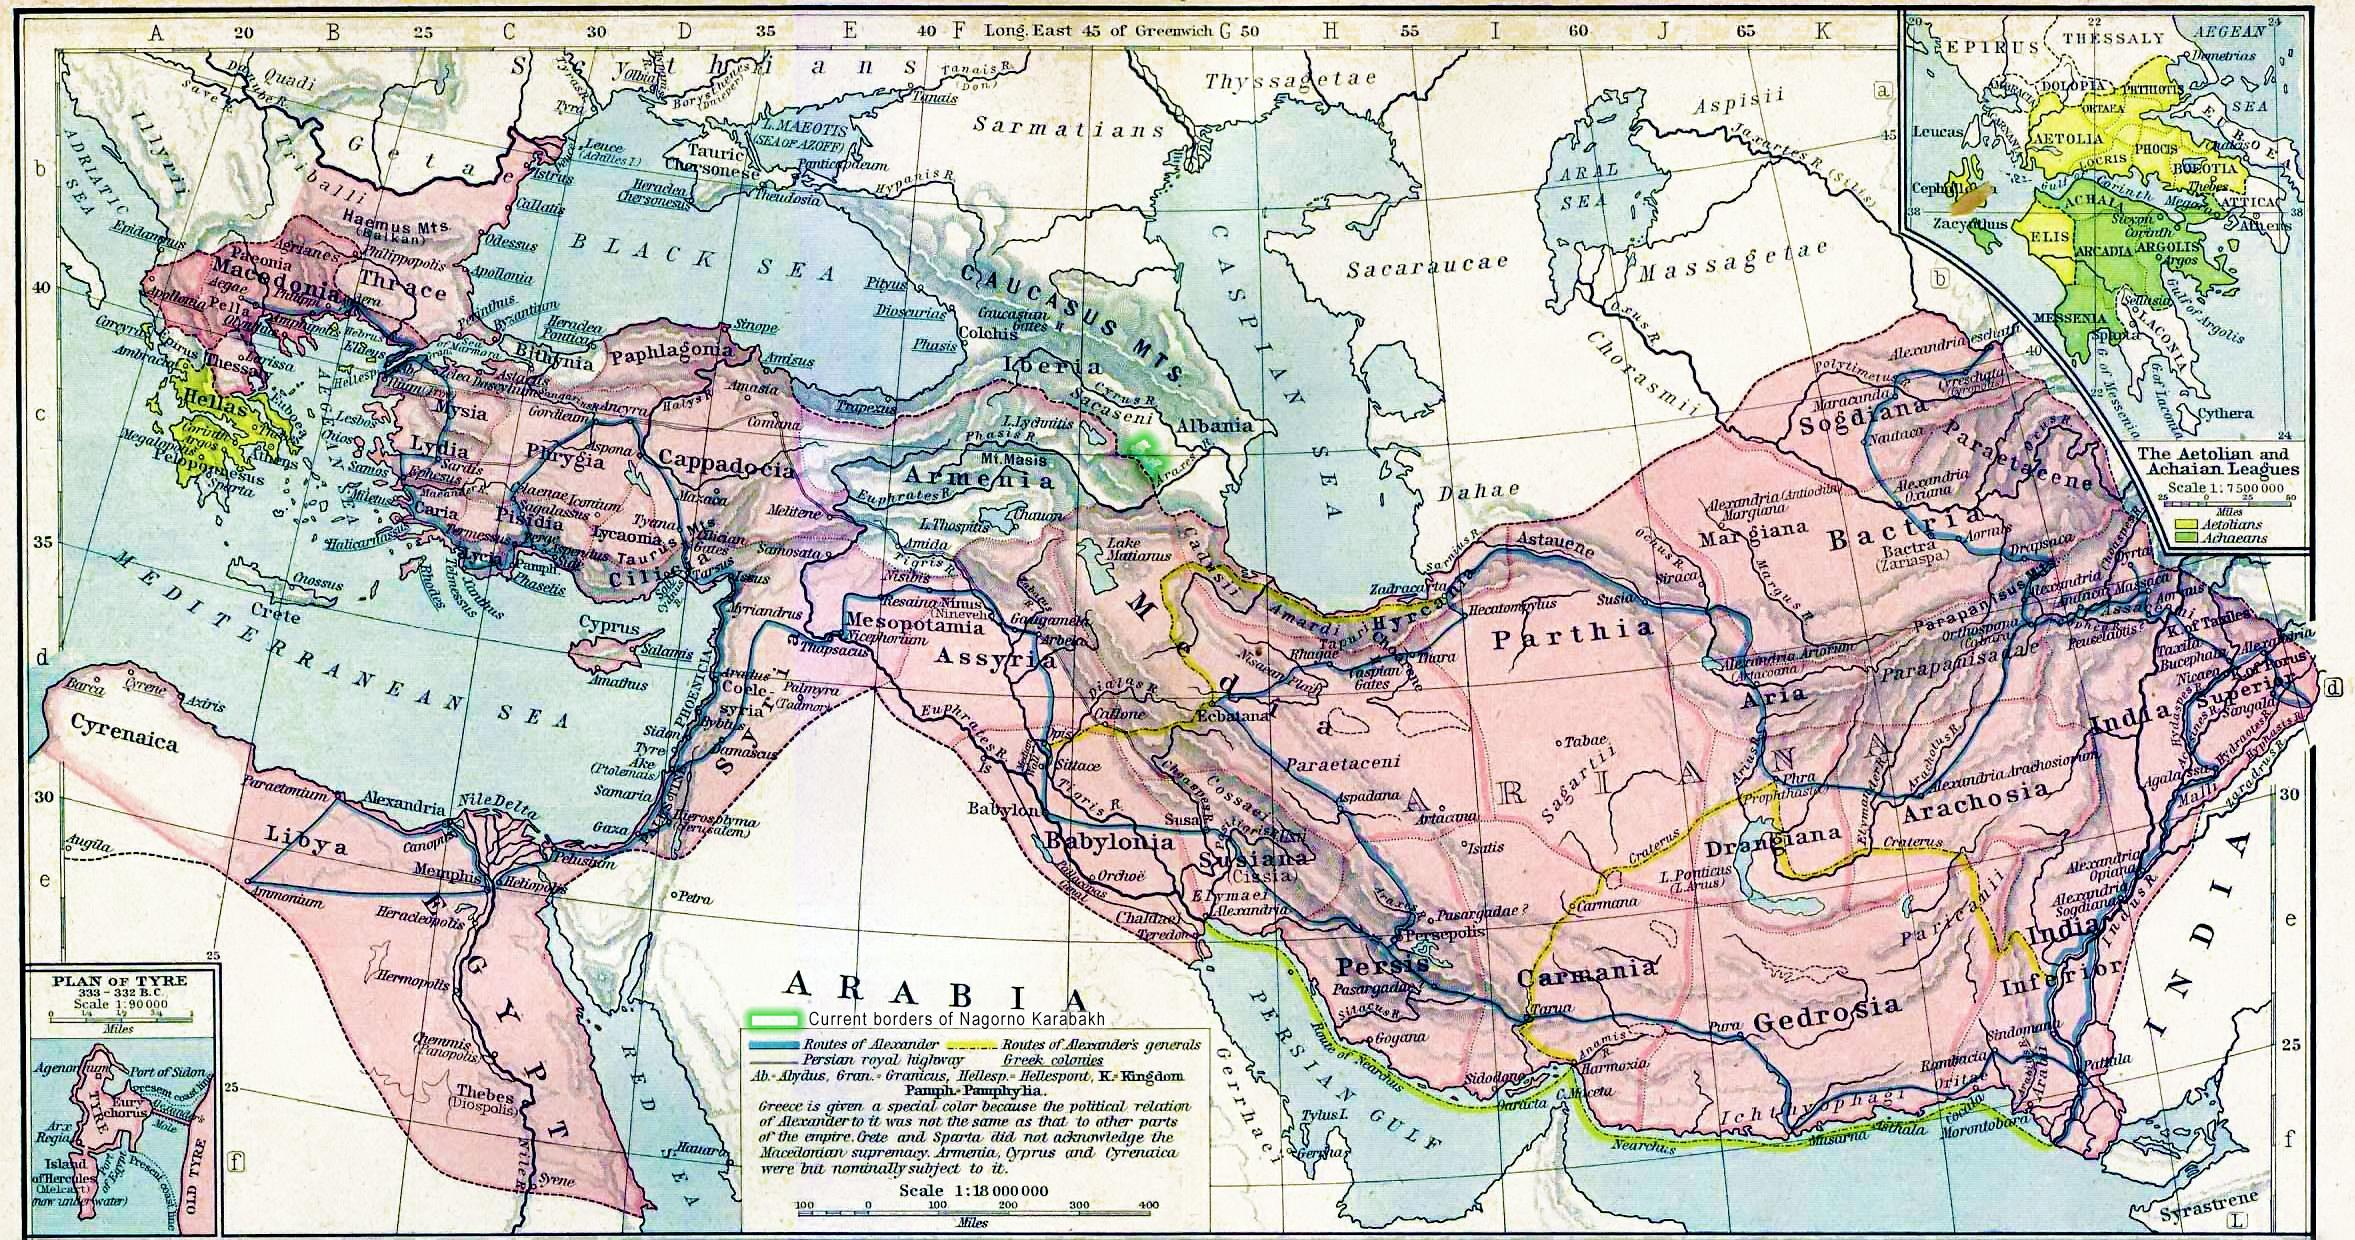 Karabakh as a part of Caucasian Albania